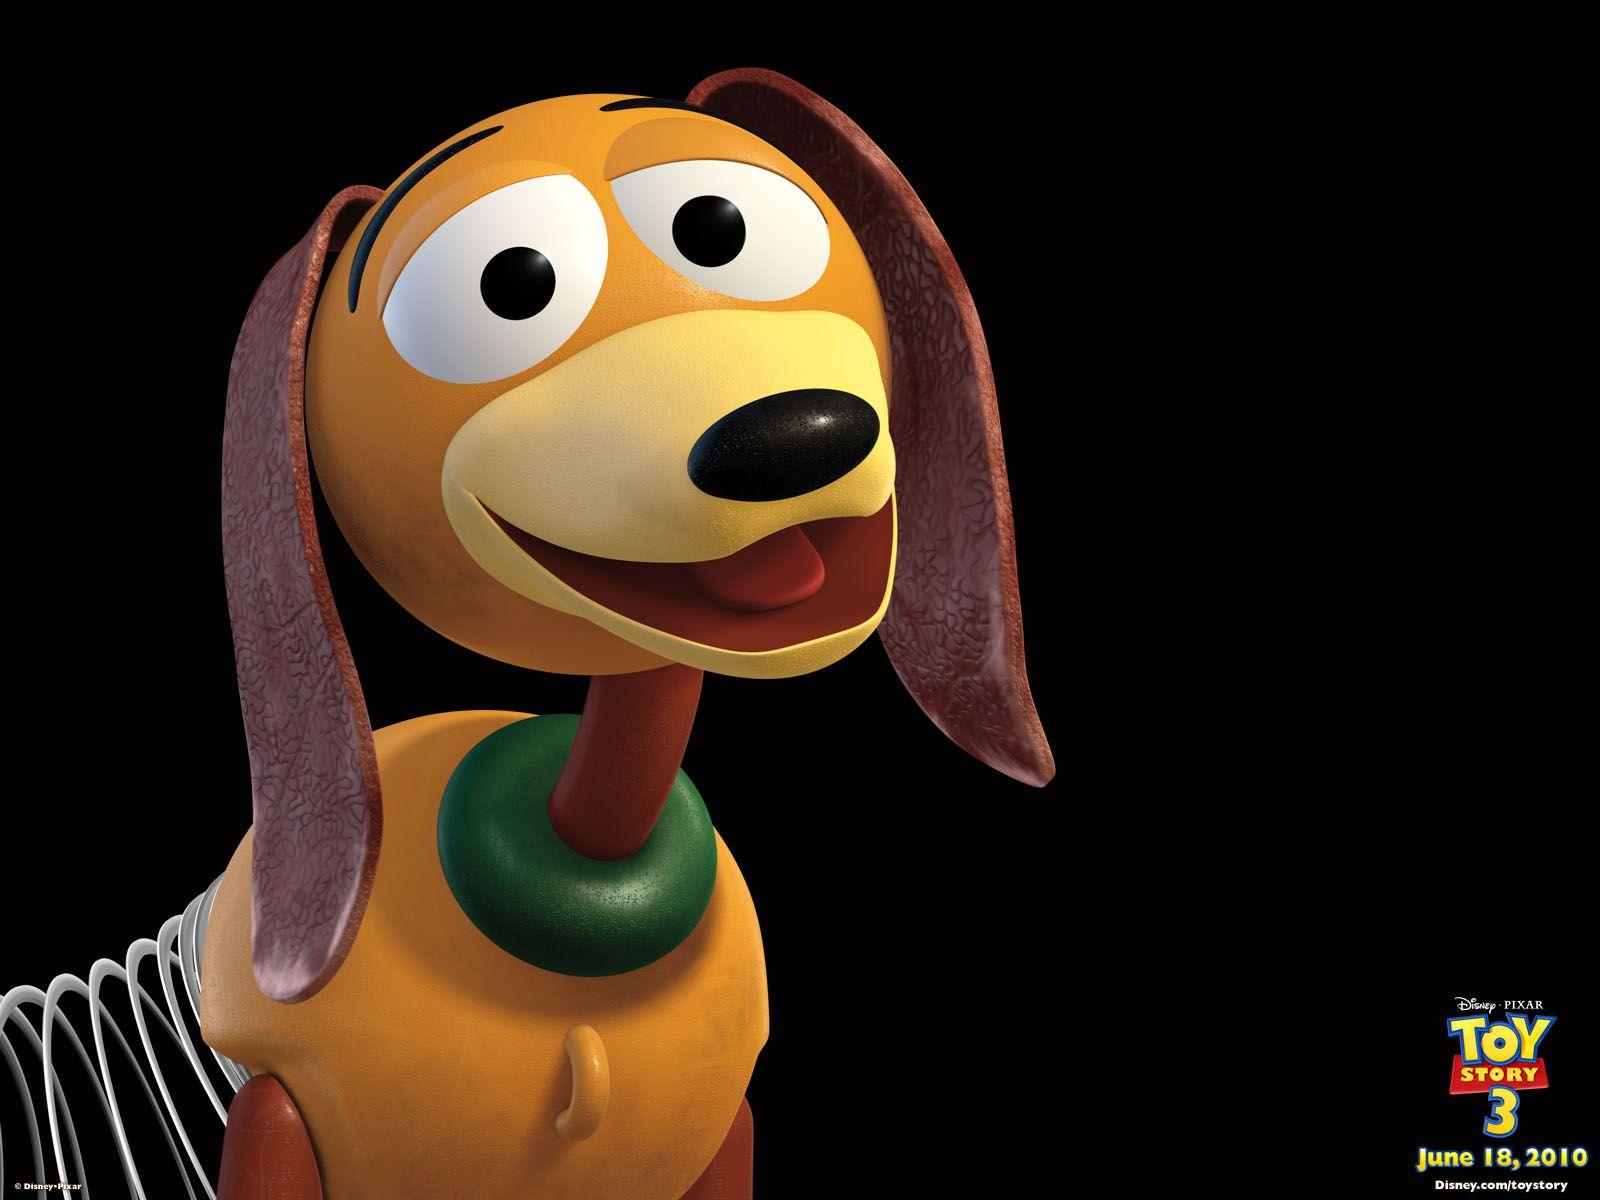 Slinky Dog Toy Story Toy Story Slinky Toy Story 3